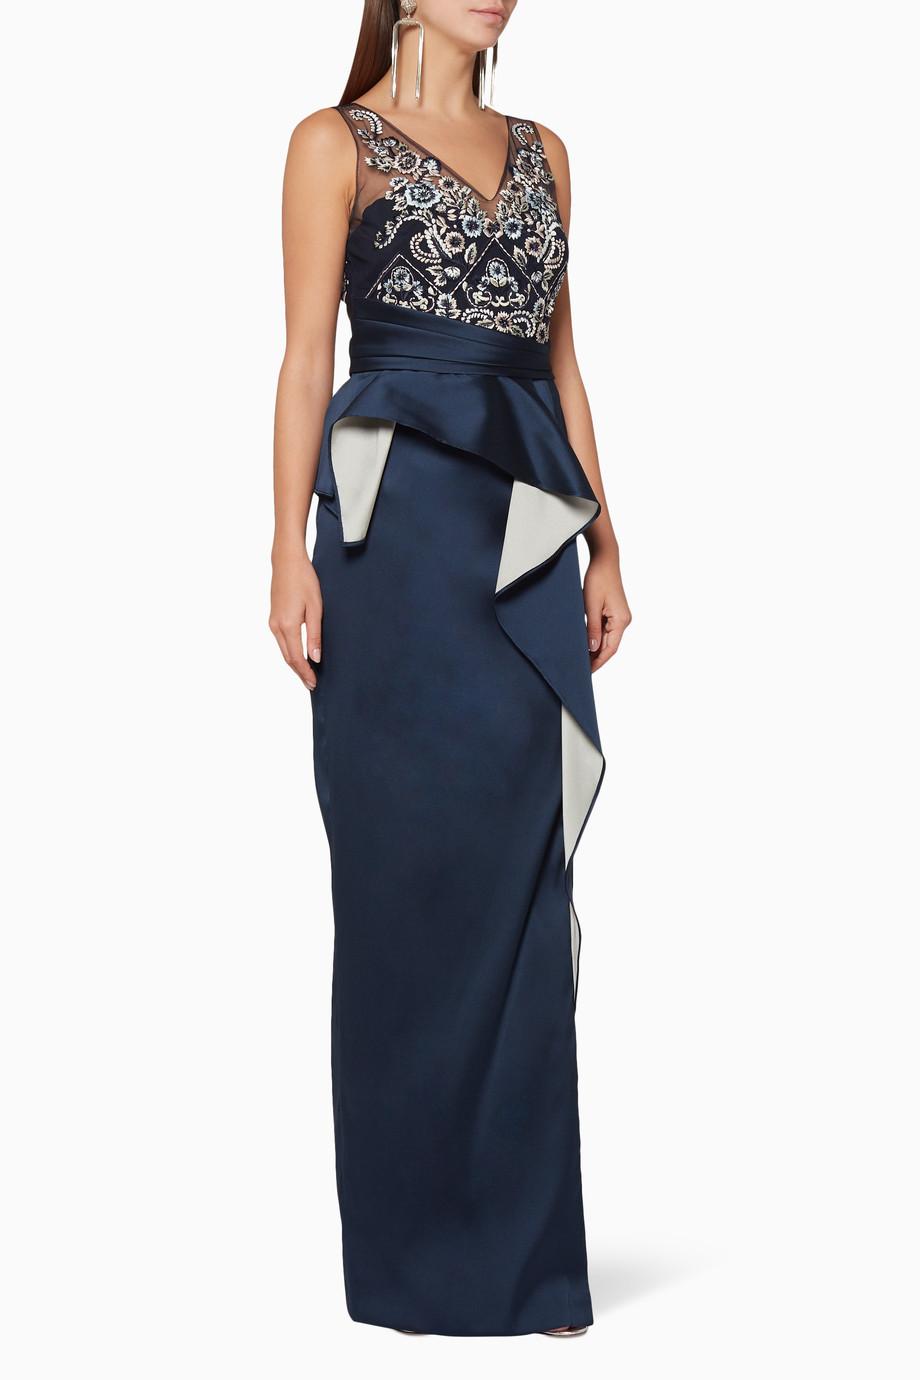 e49c6e6f Shop Marchesa Notte Blue Navy Two-Tone Peplum Column Gown for ...